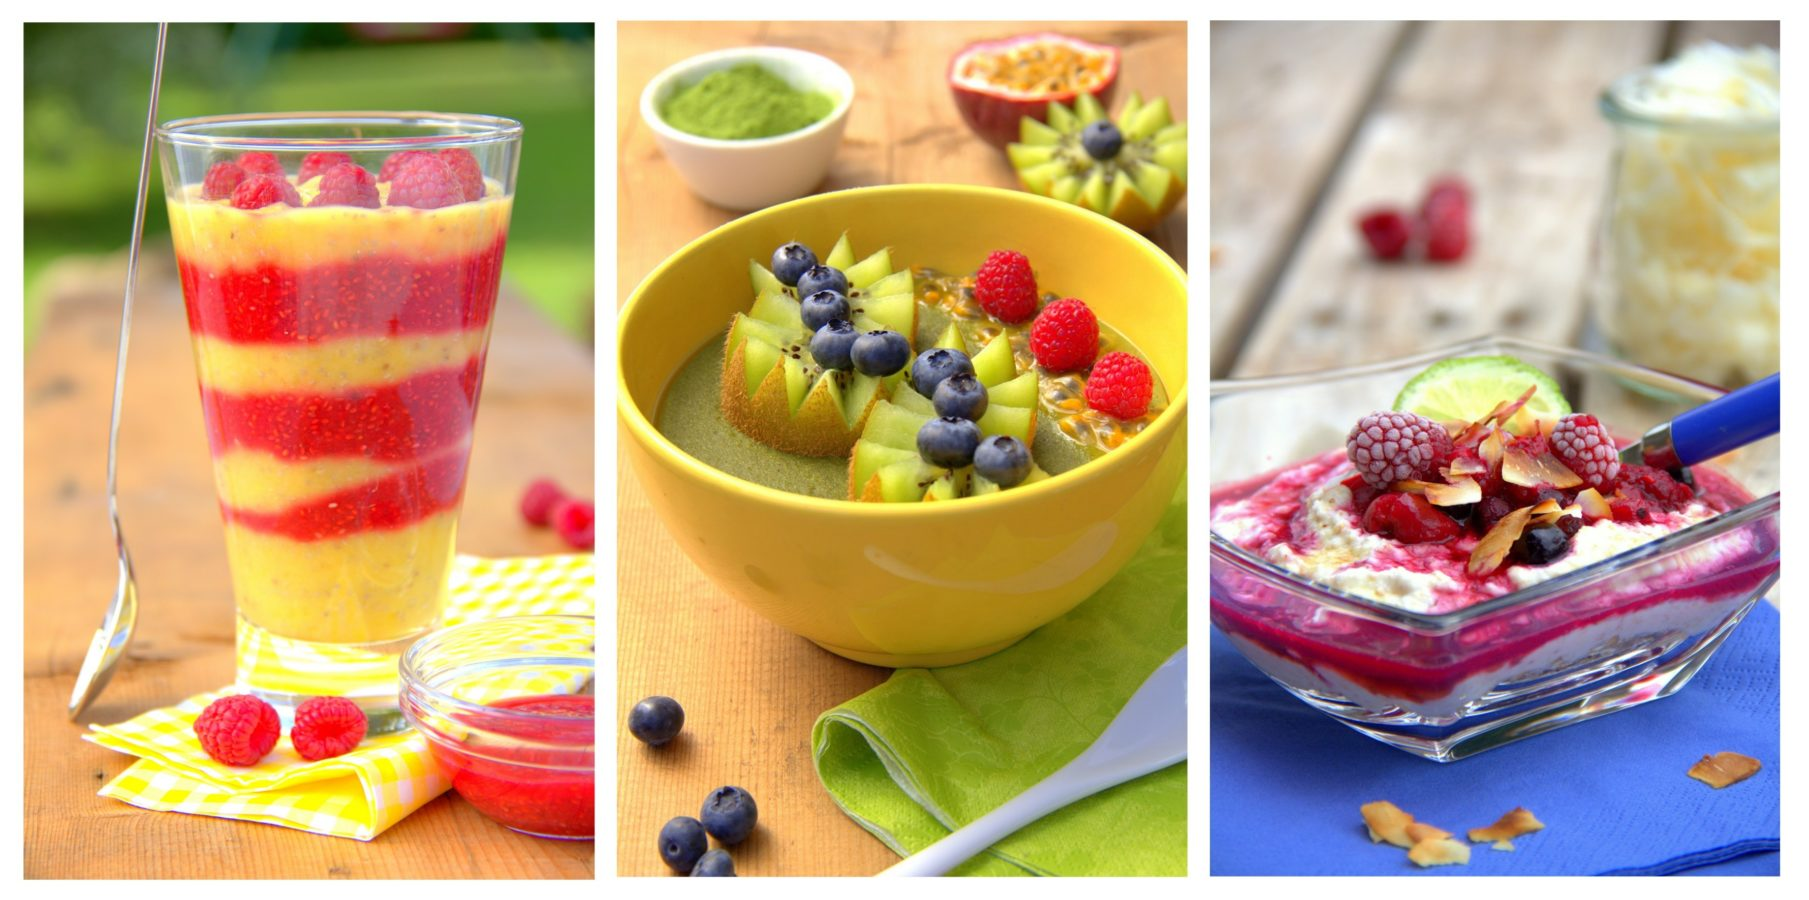 Aprikosen vegane Frühstücksideen vegan frühstücken ohne Soja gesunde Rezepte Frühstücksideen